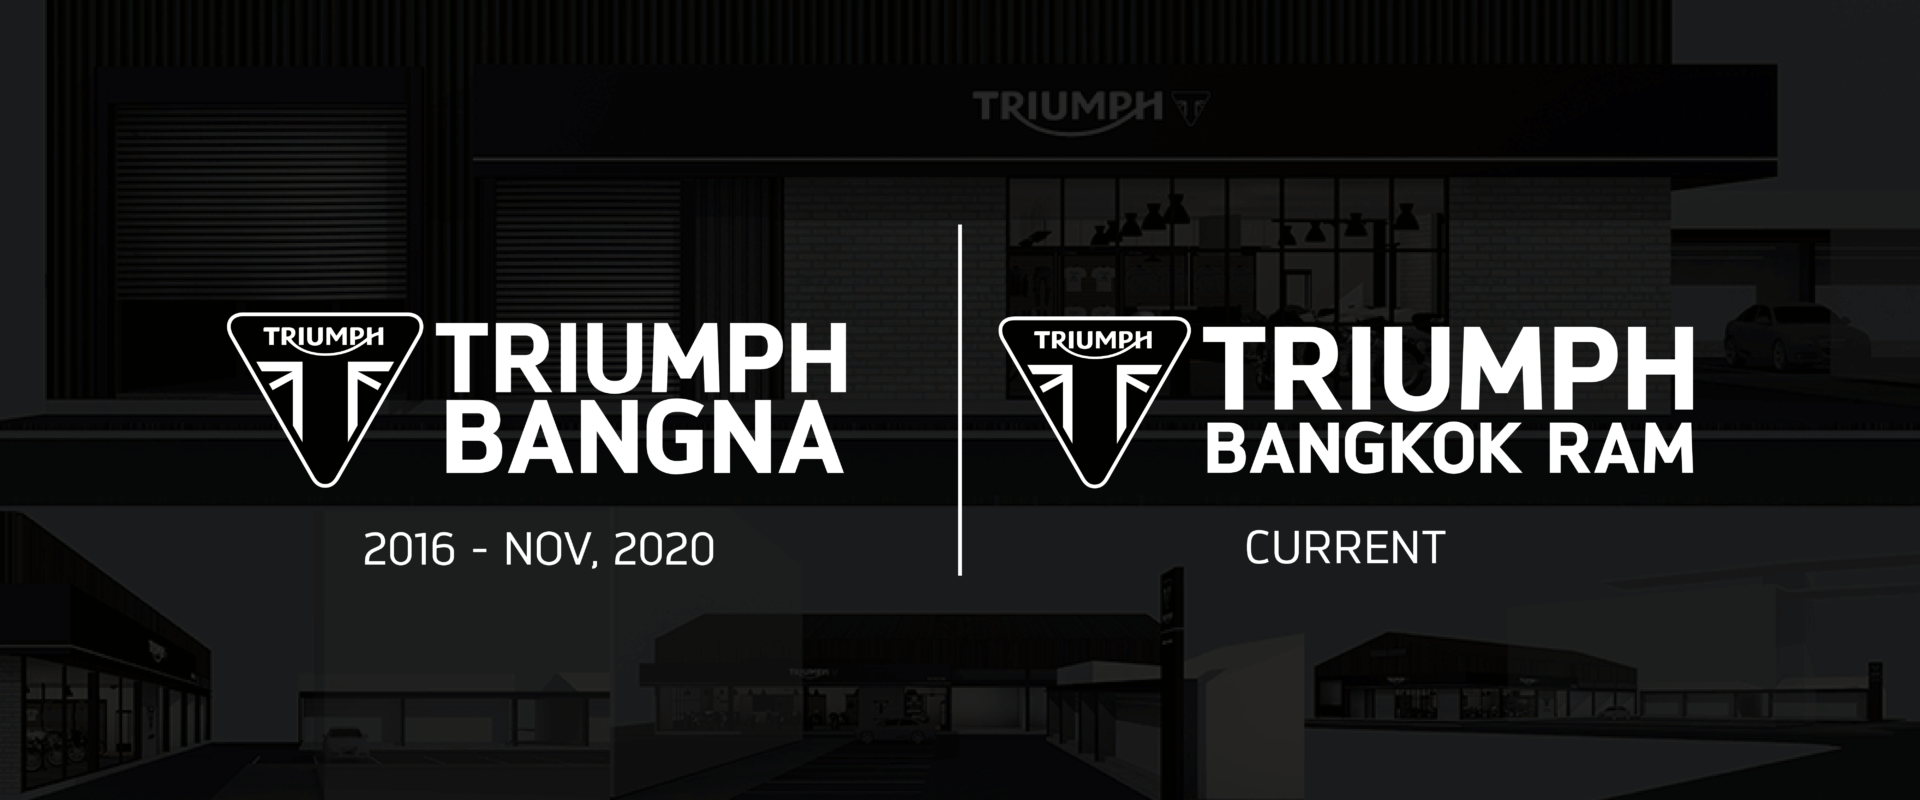 Triumph Bangkok Ram Current-03